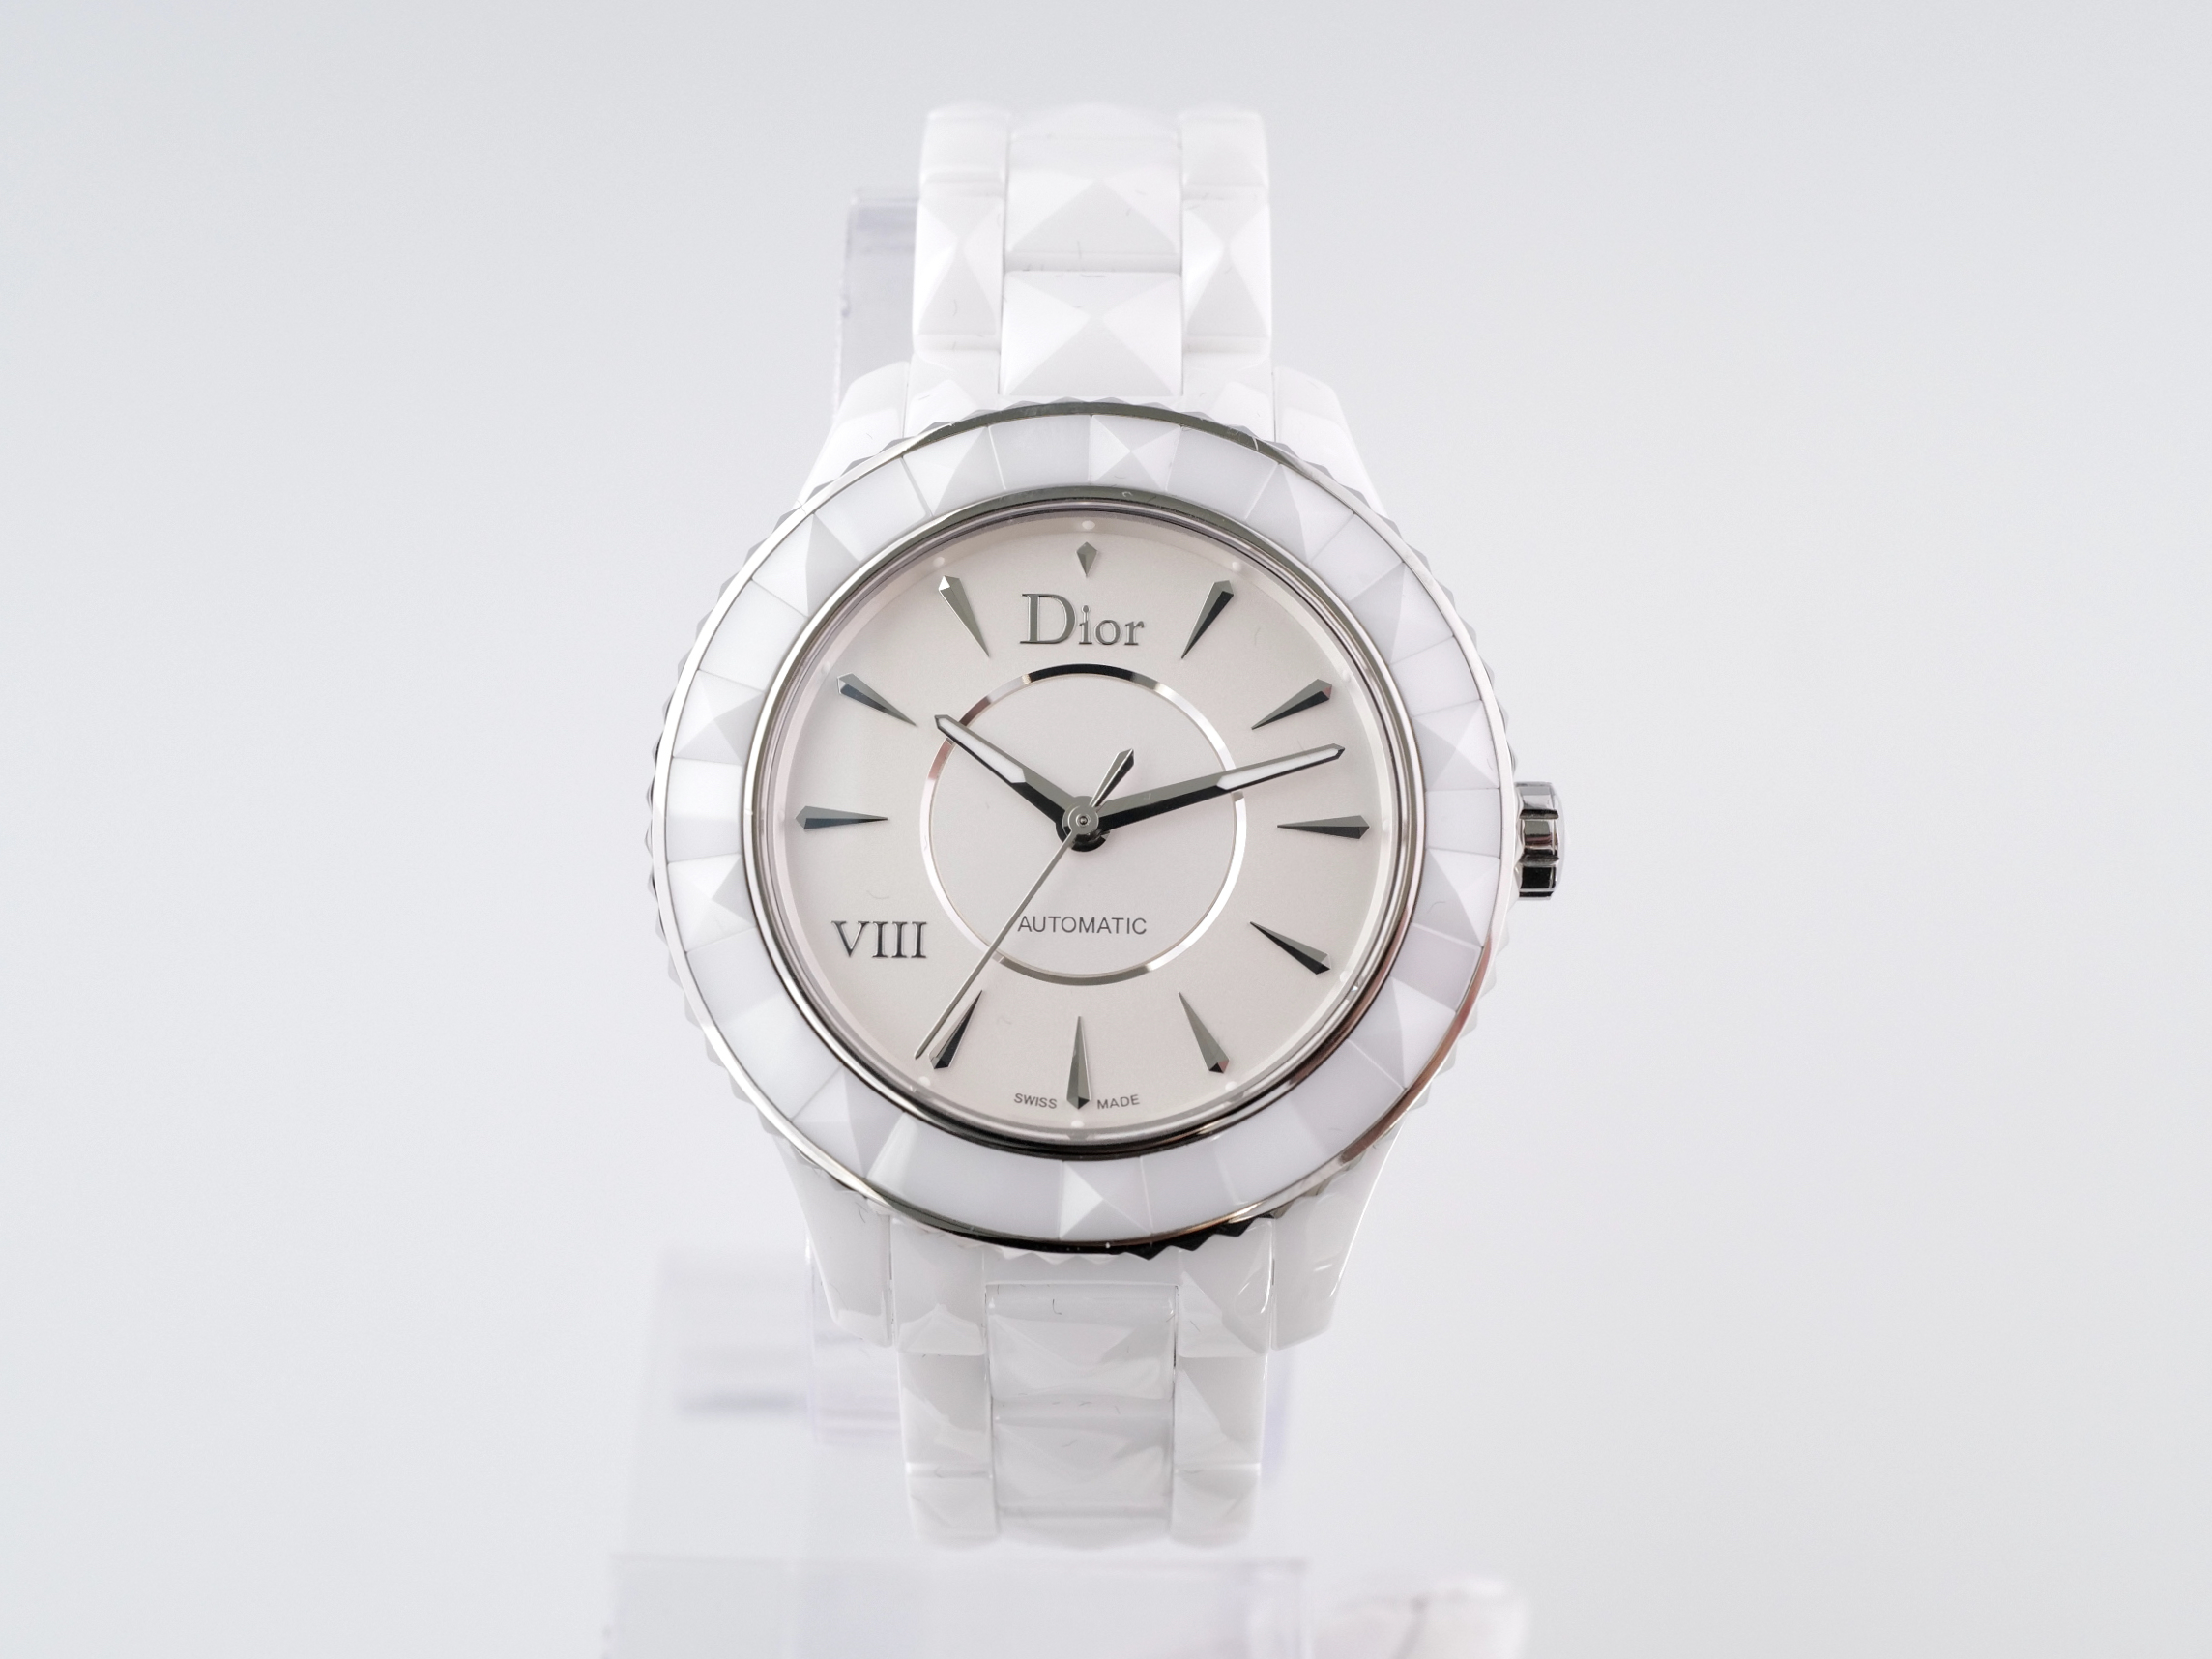 Dior VIII White Ceramic Automatic